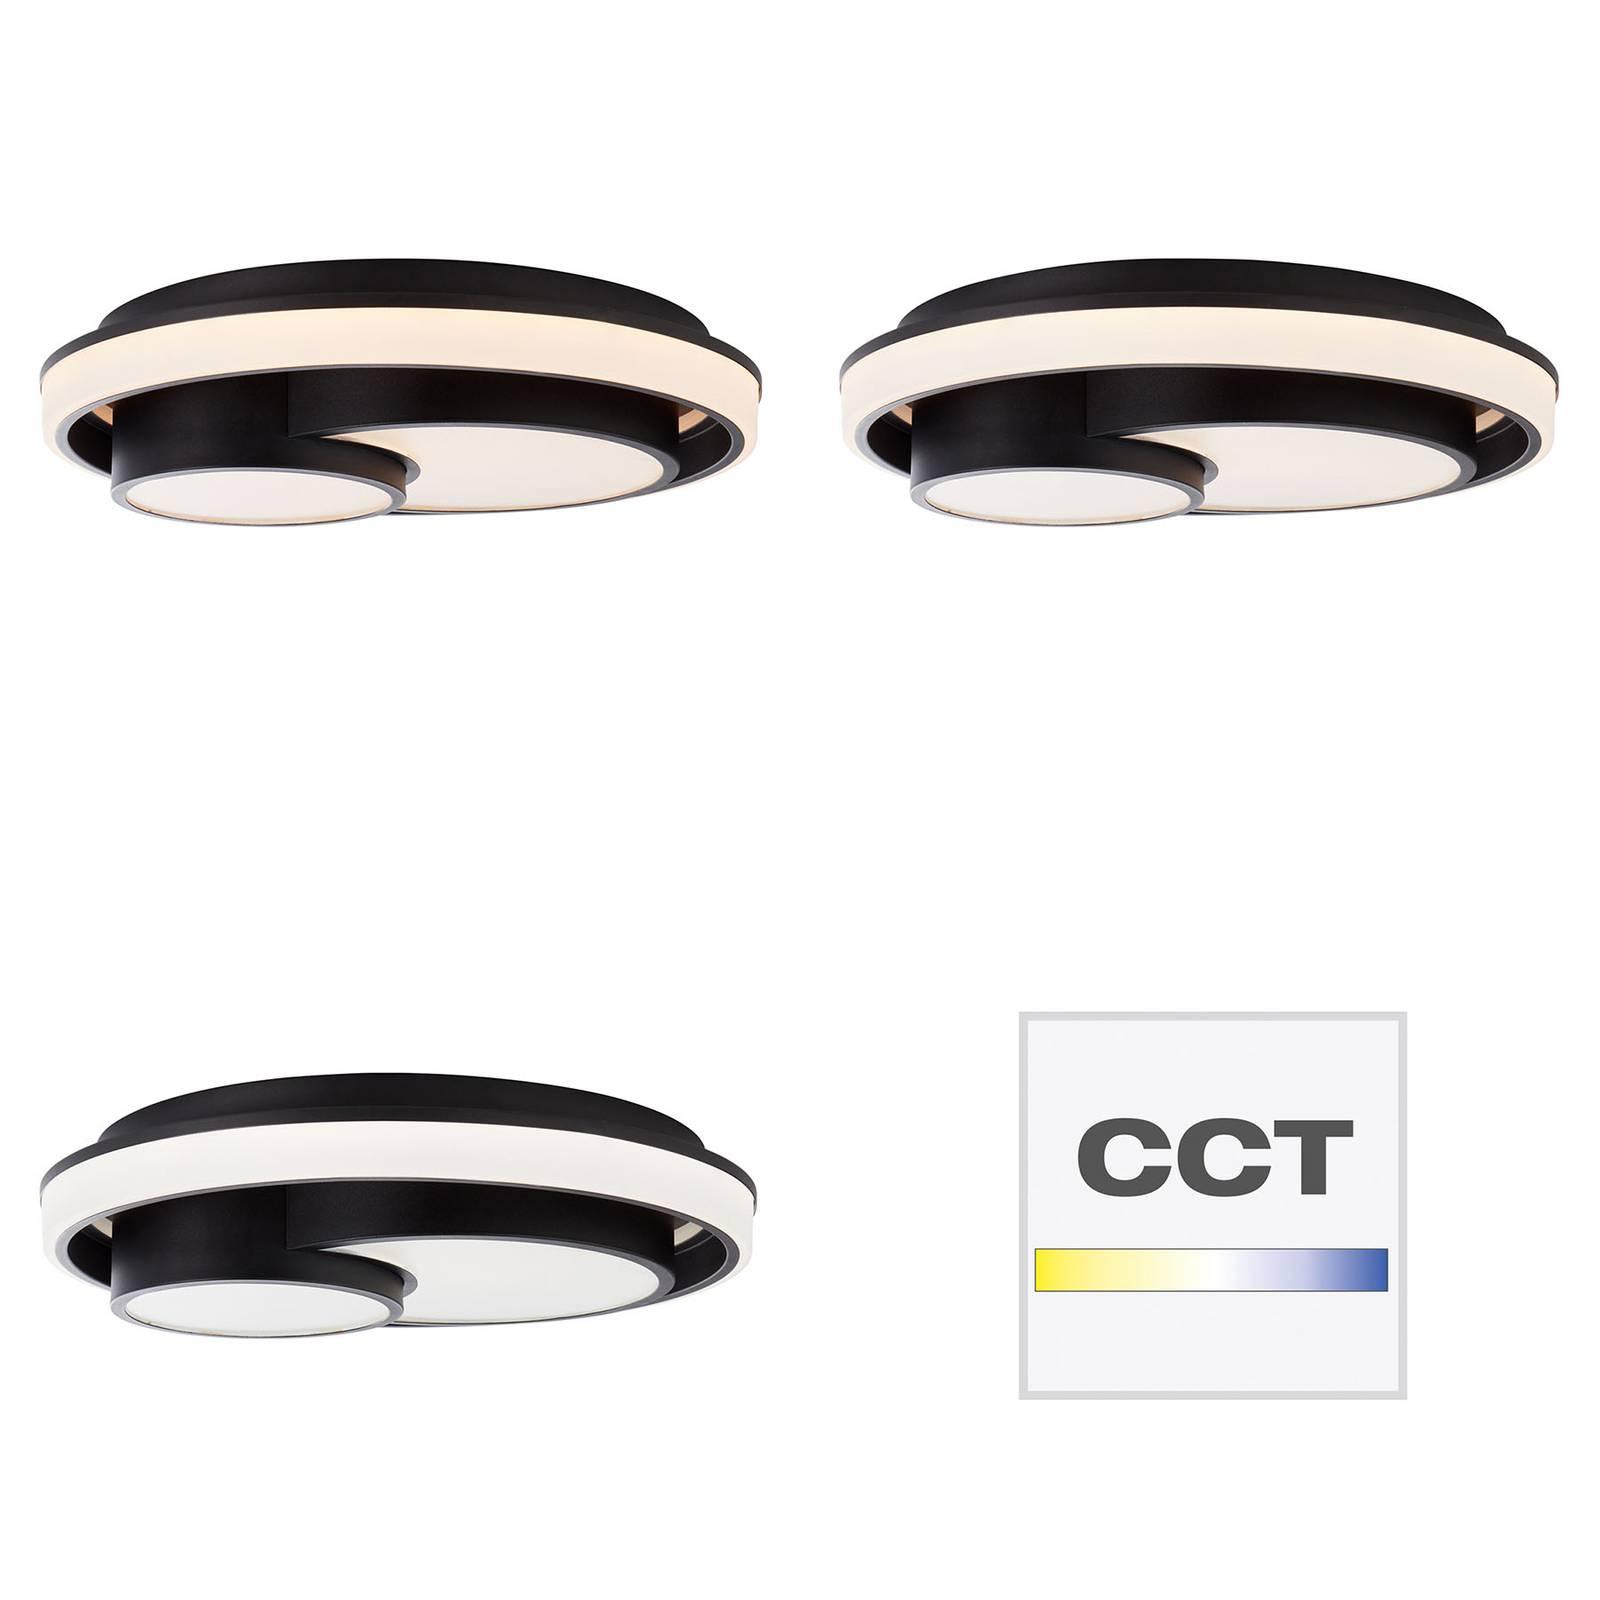 AEG Dwain-LED-kattovalaisin, himmennys CCT, remote